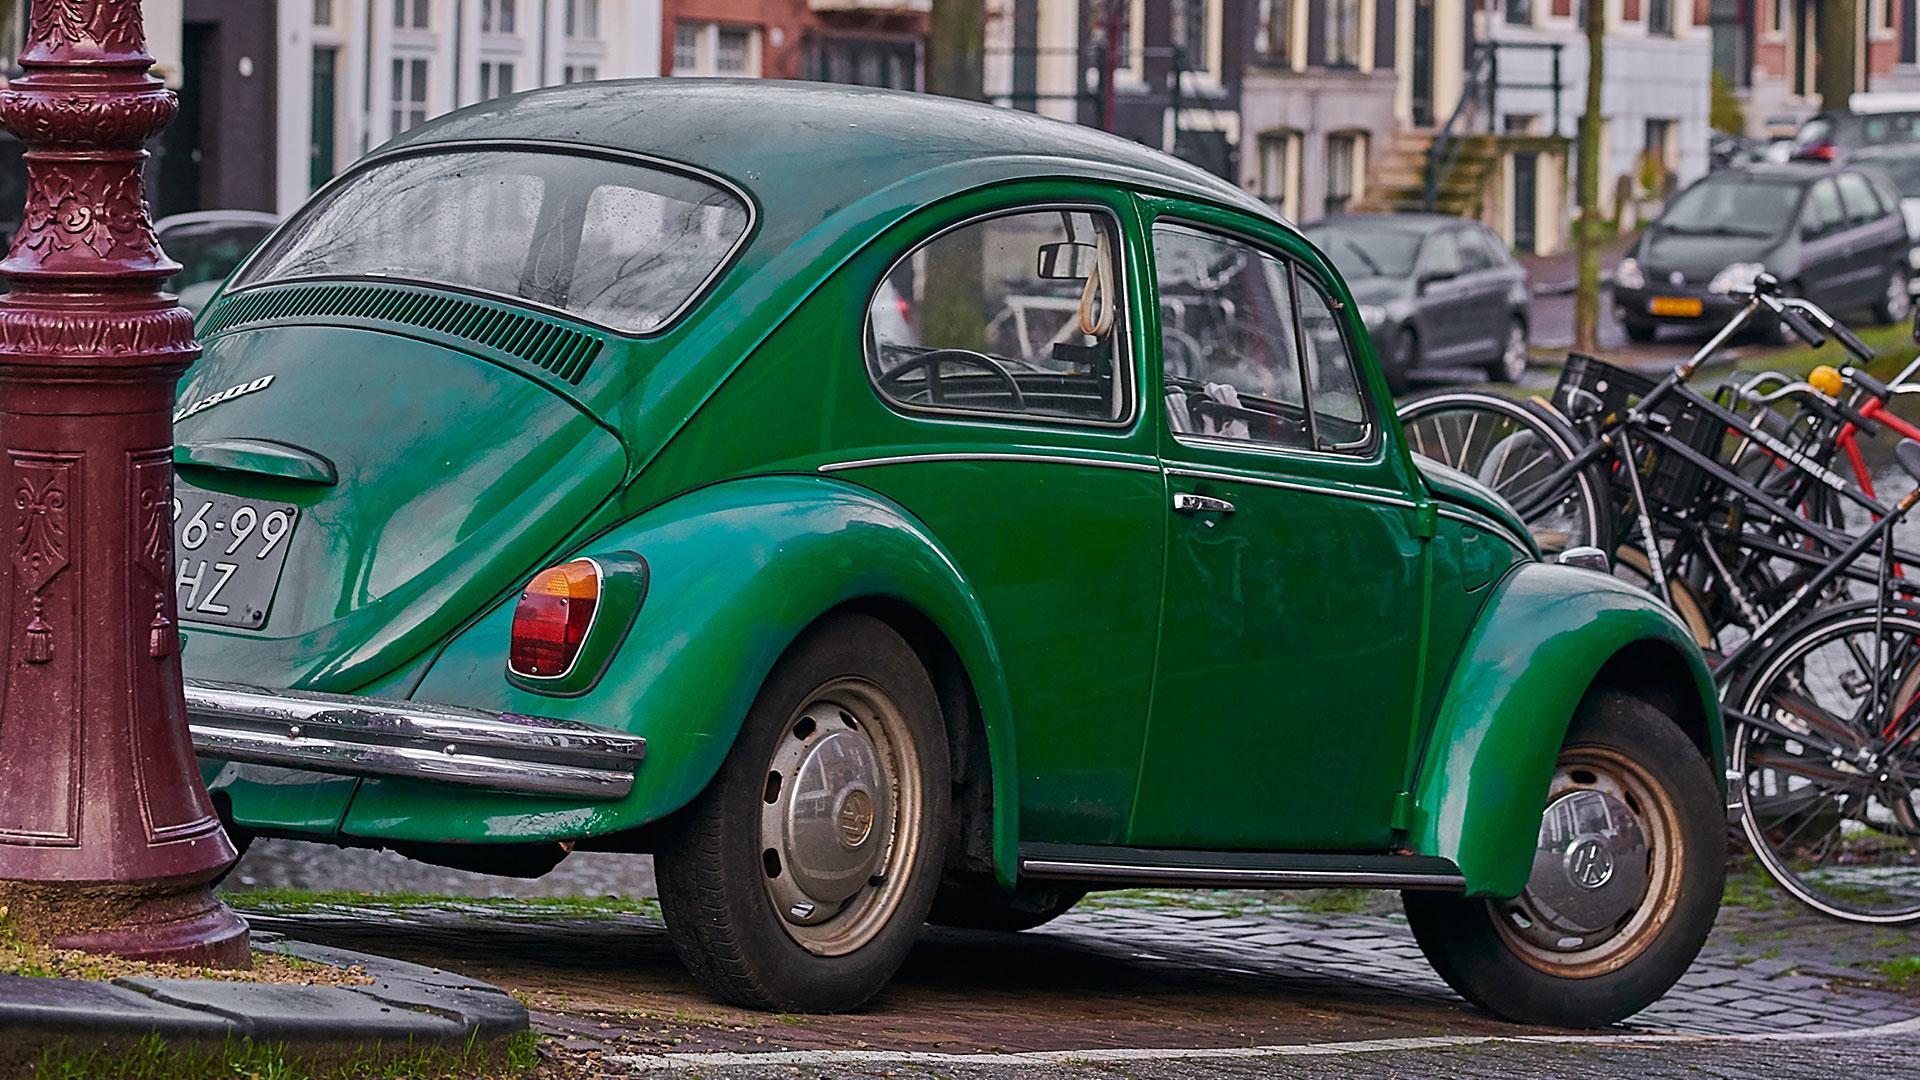 Groene Volkswagen Kever in Nederland